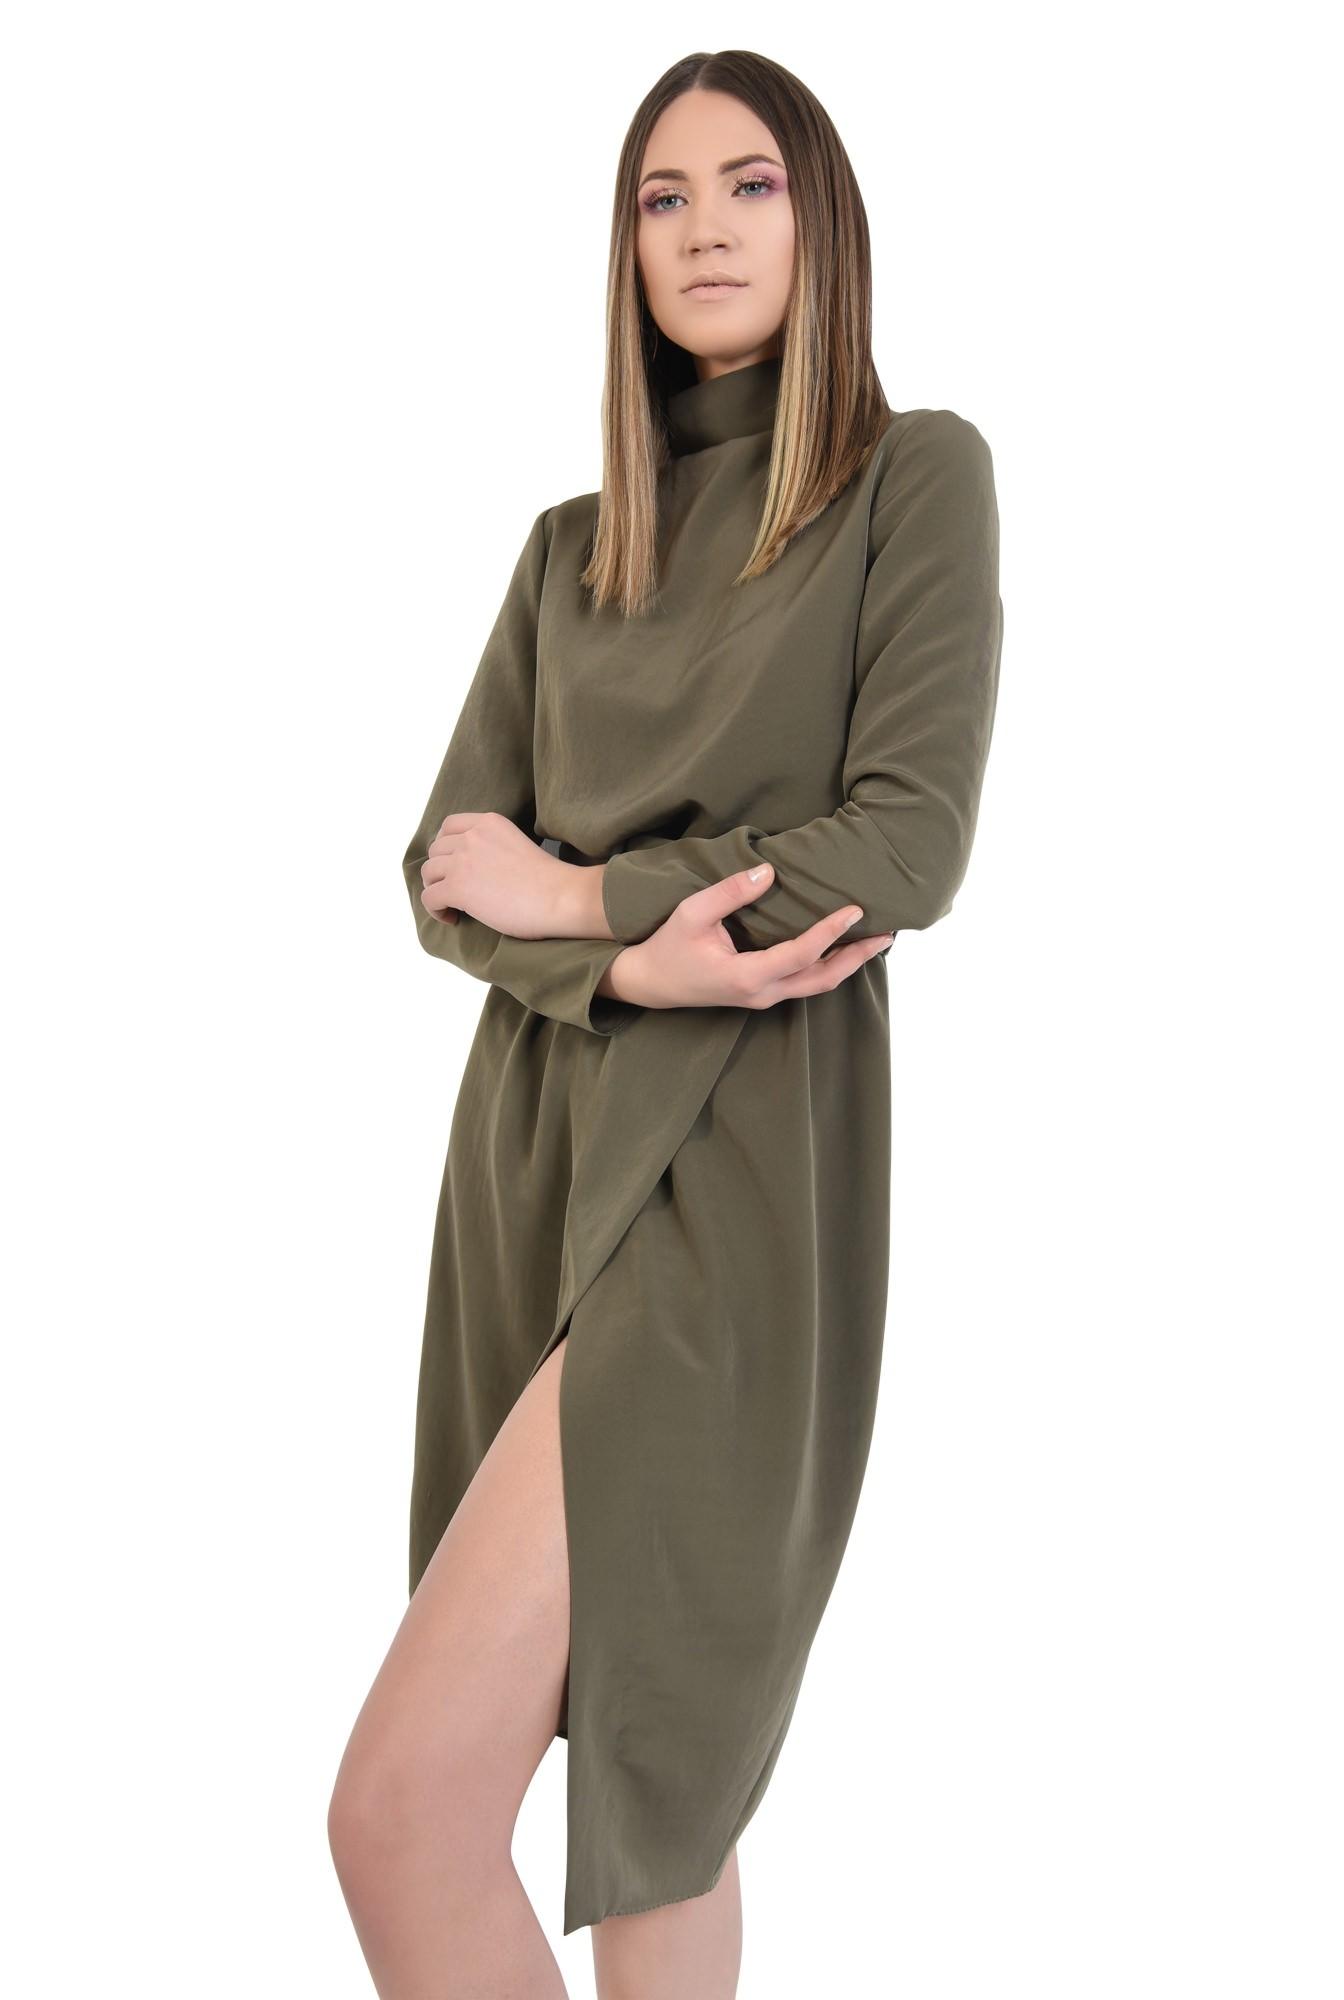 0 - rochie eleganta, de zi, verde, kaki, cu curea, maneci lungi